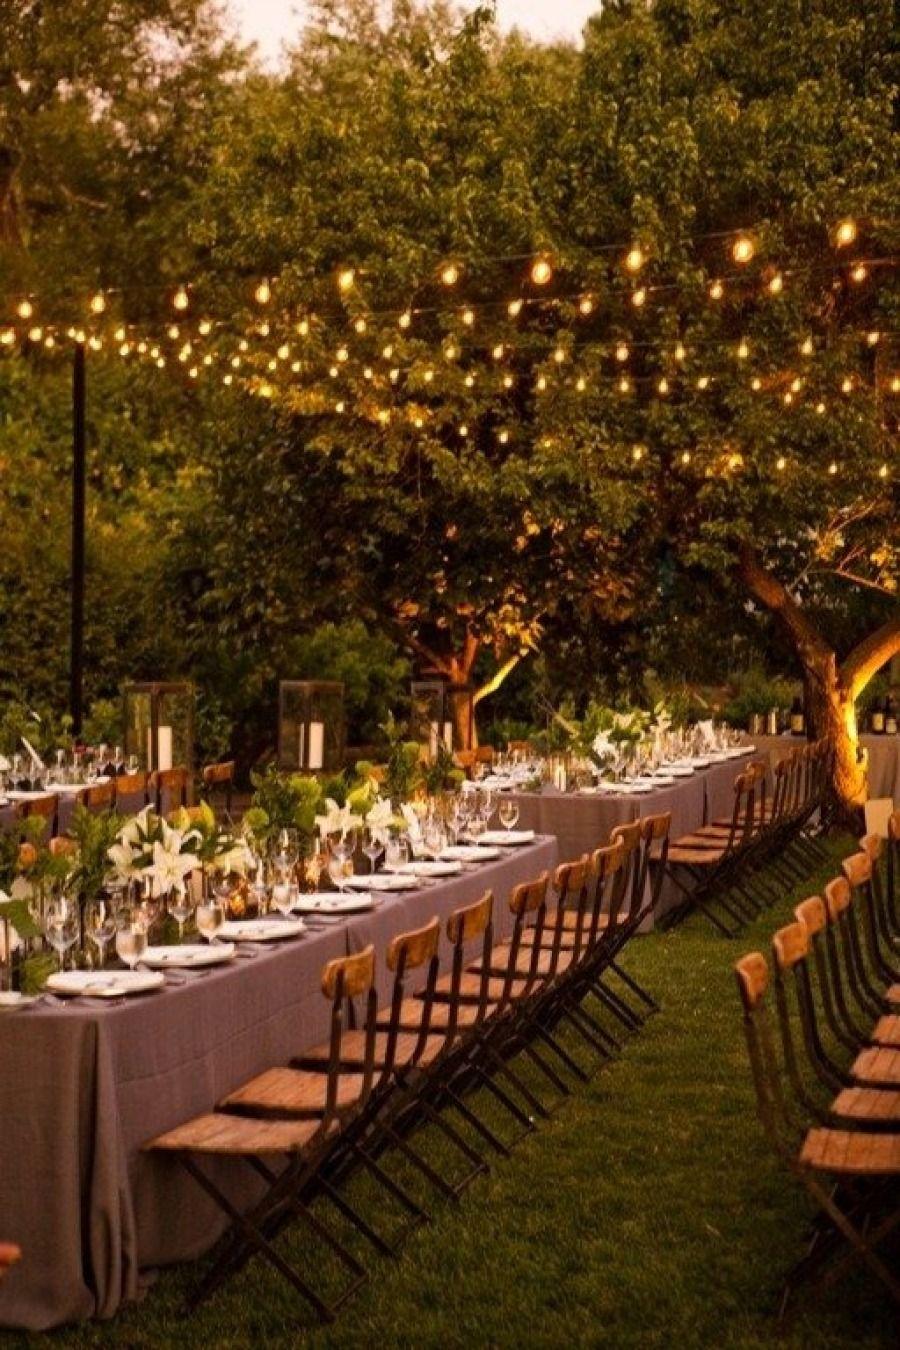 wedding reception dinner ideas on budget%0A Outdoor Reception  Decor  Flowers   Lighting via sillapere  Photograpy via  Lauren   Abby Photography  Wedding Planning  Design   Production via